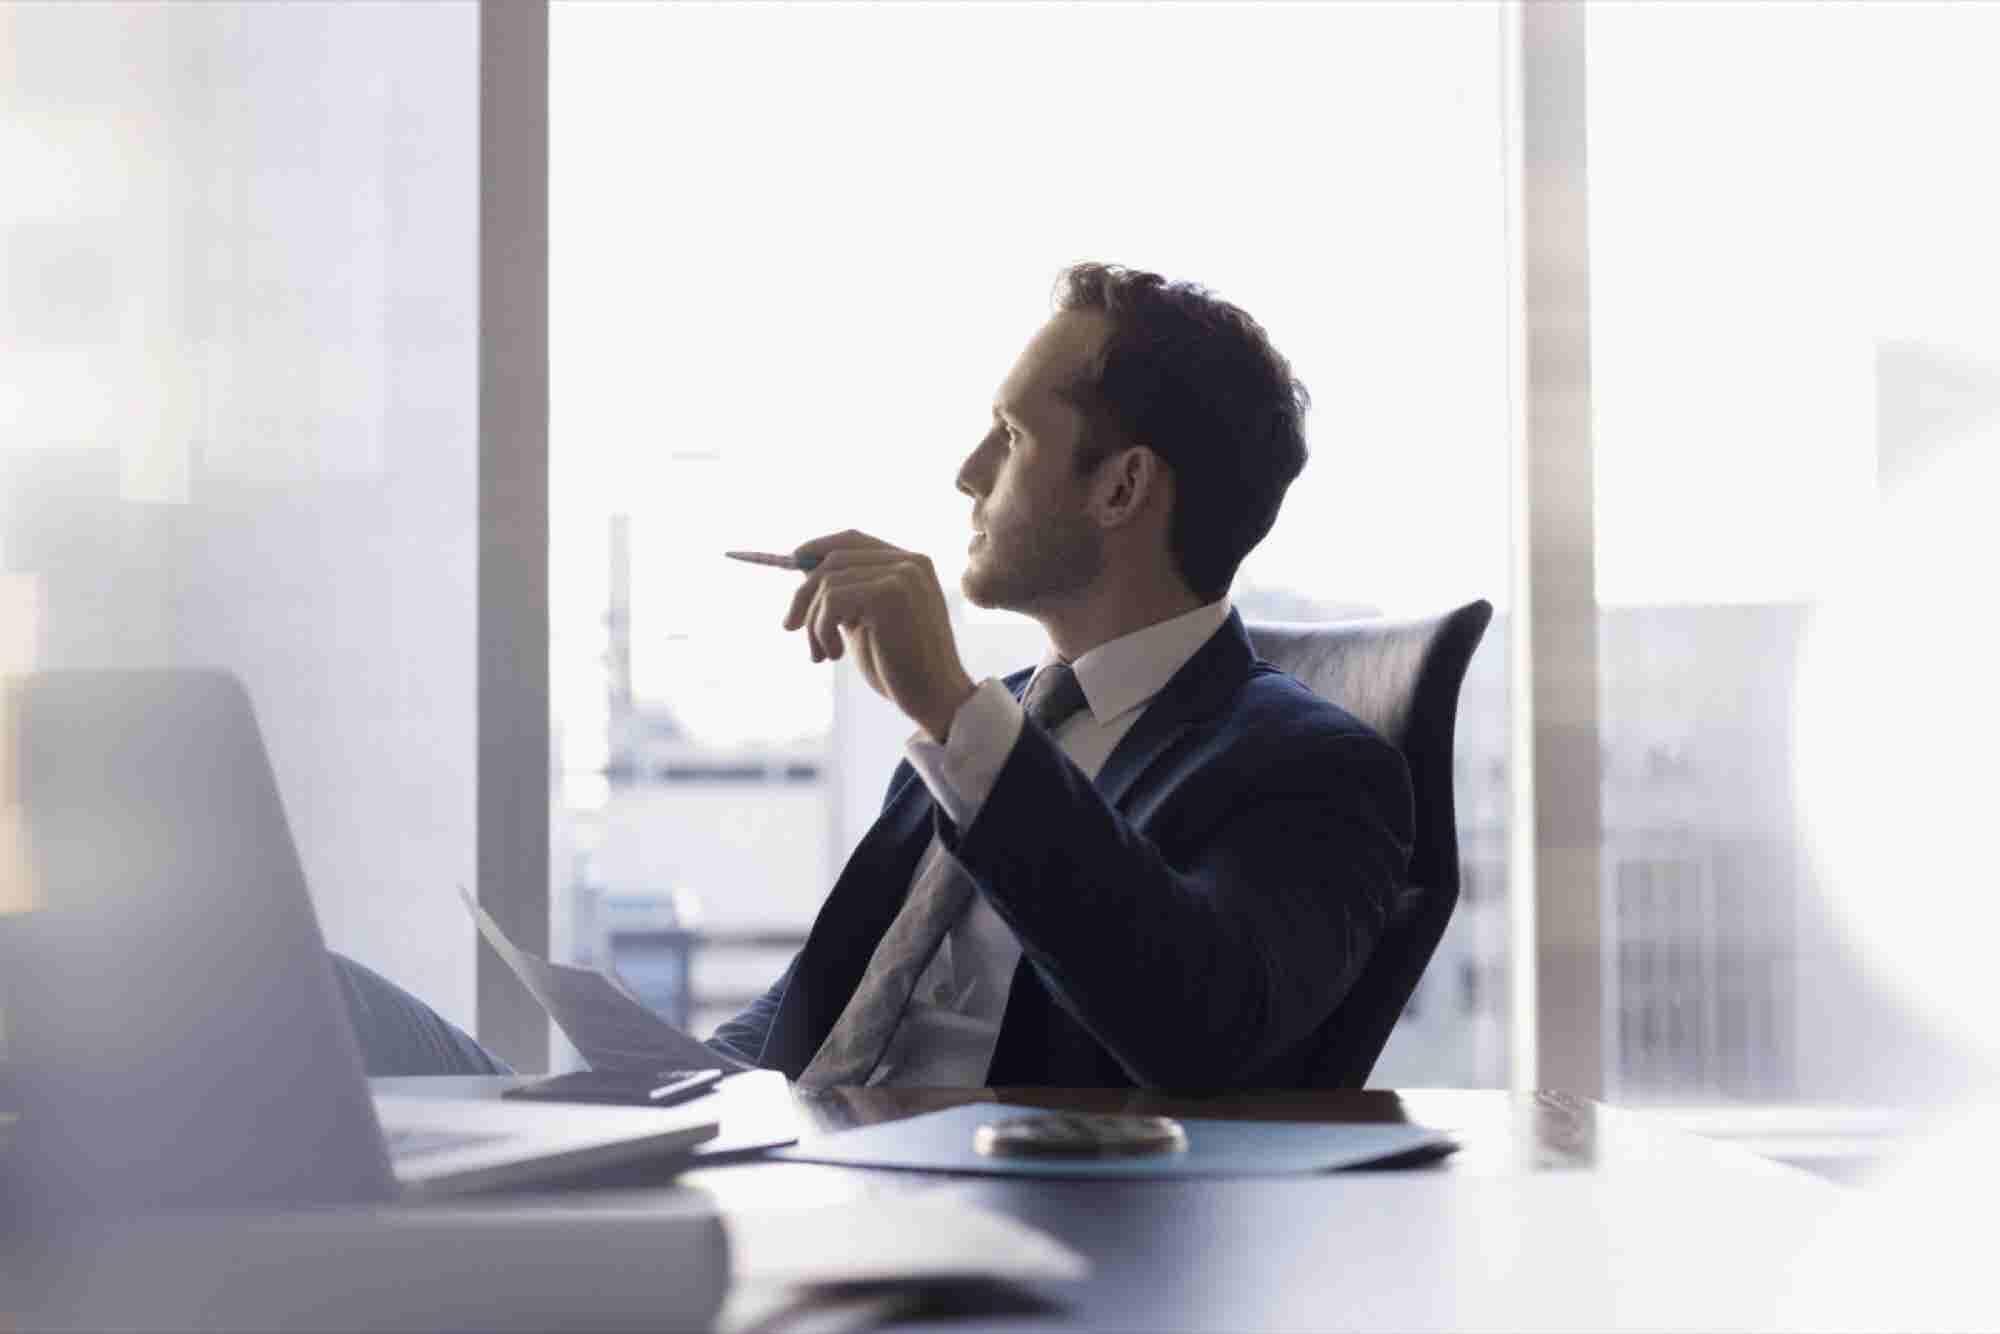 Making Decisions Under Uncertain Circumstances